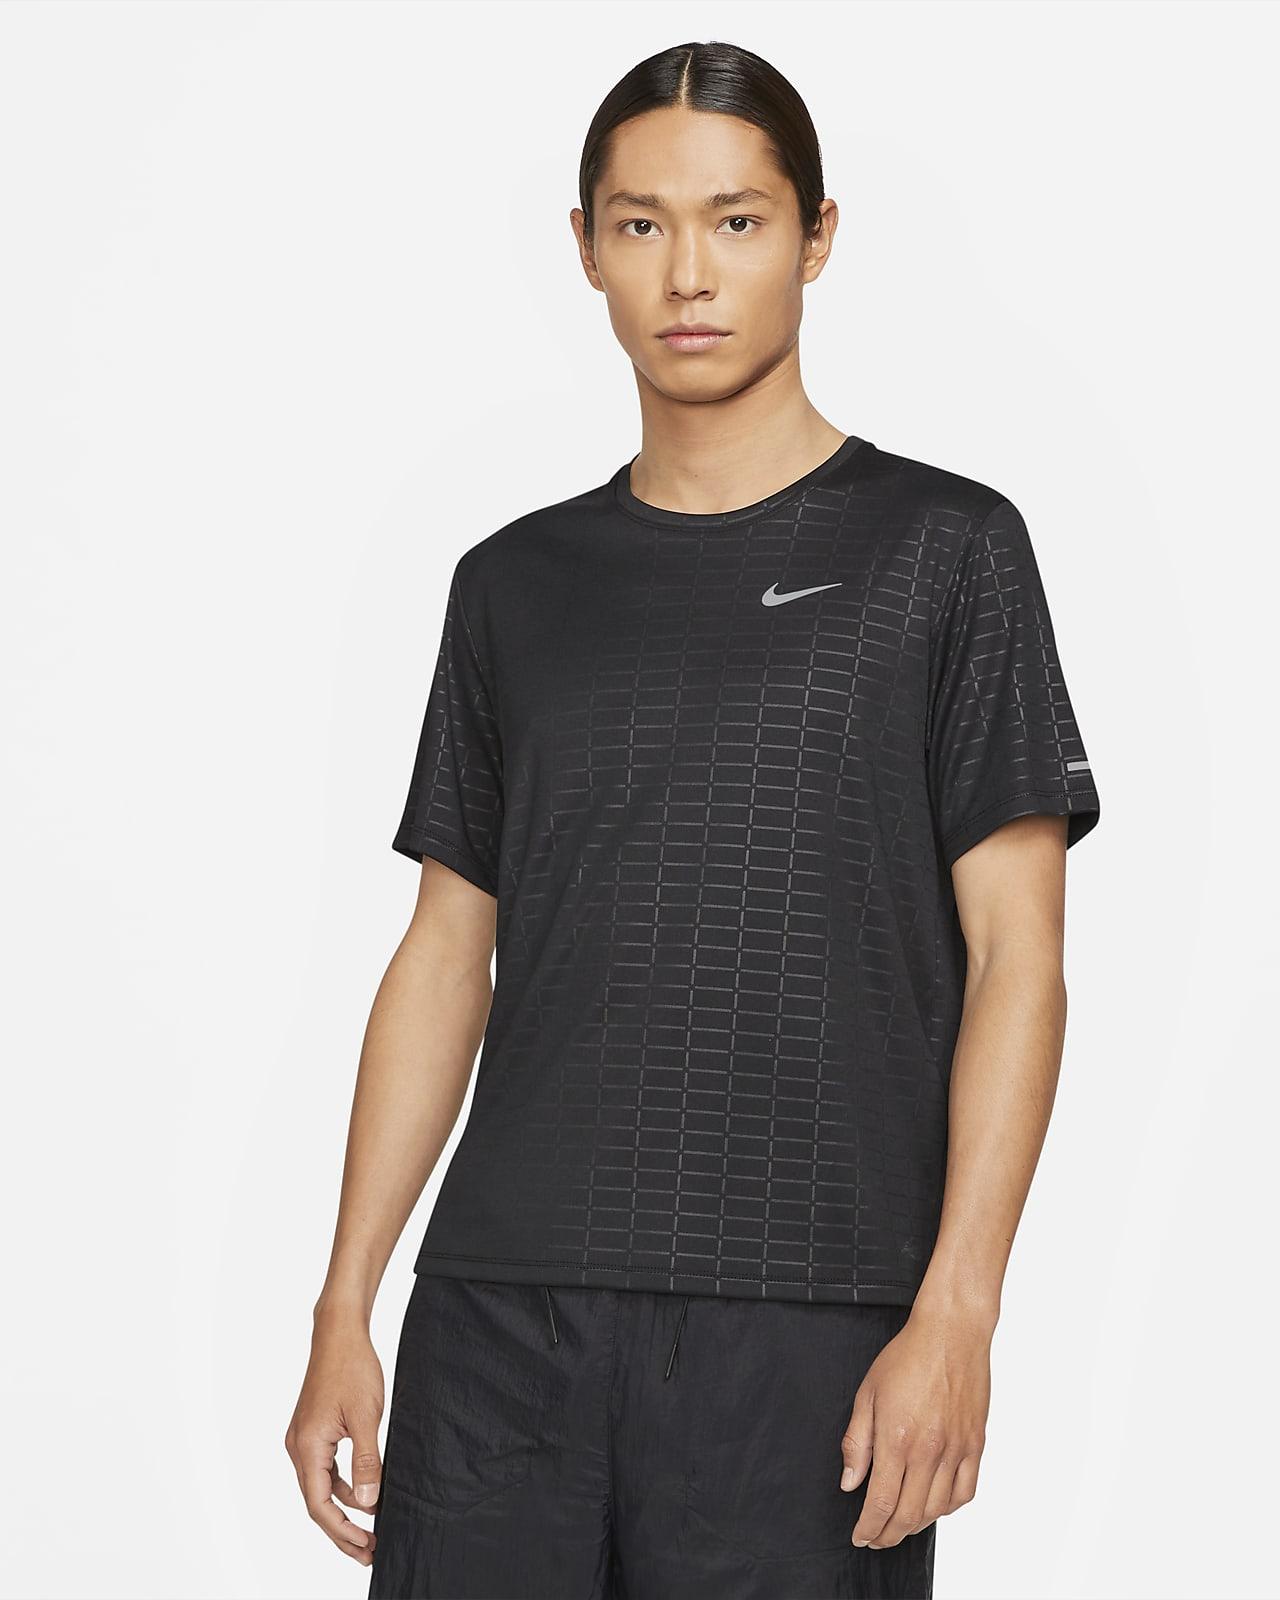 Nike Miler Run Division Men's Short-Sleeve Running Top